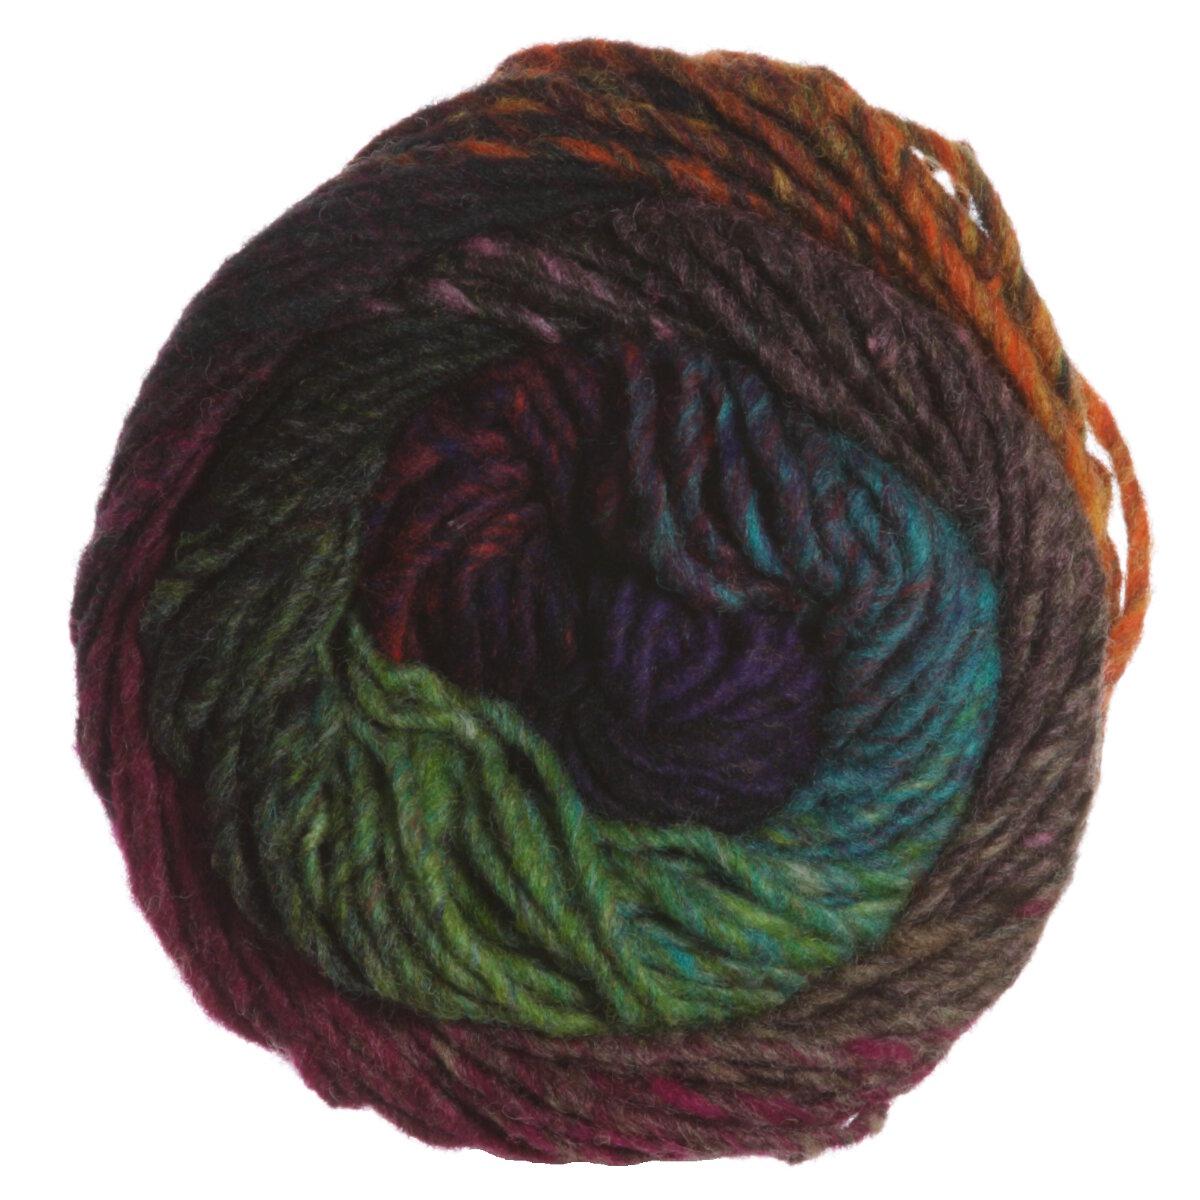 Noro Yarn : Noro Kureyon Yarn at Jimmy Beans Wool